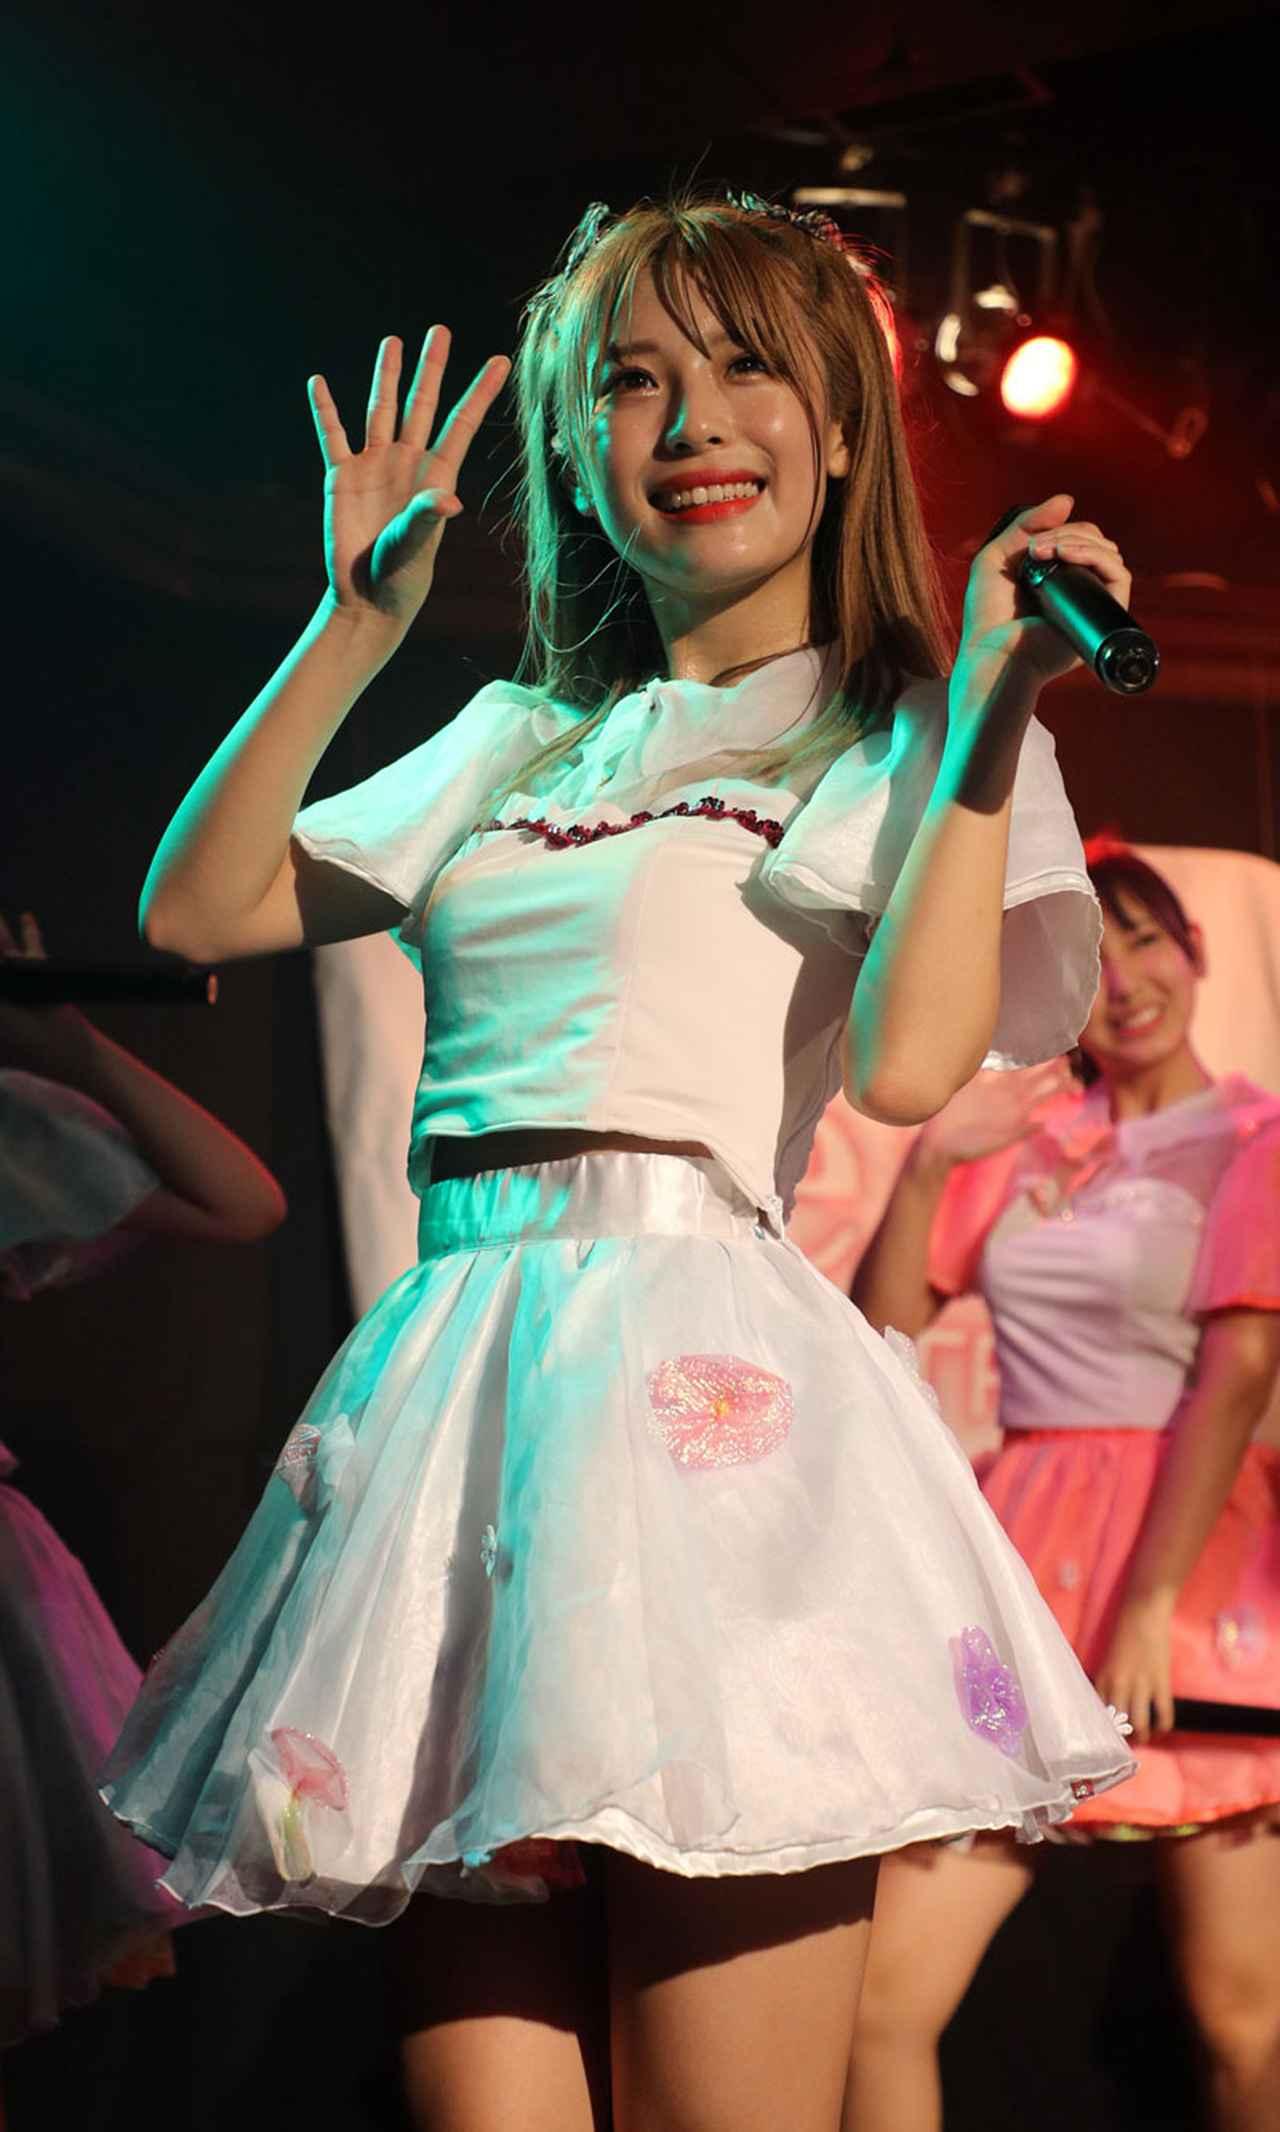 Images : 26番目の画像 - 「dela/ミスマガジングランプリ受賞者・沢口愛華を含む名古屋の人気アイドル・グループが、定例東京公演を開催。切れ味鋭いダンス、多彩な楽曲でファンを魅了」のアルバム - Stereo Sound ONLINE